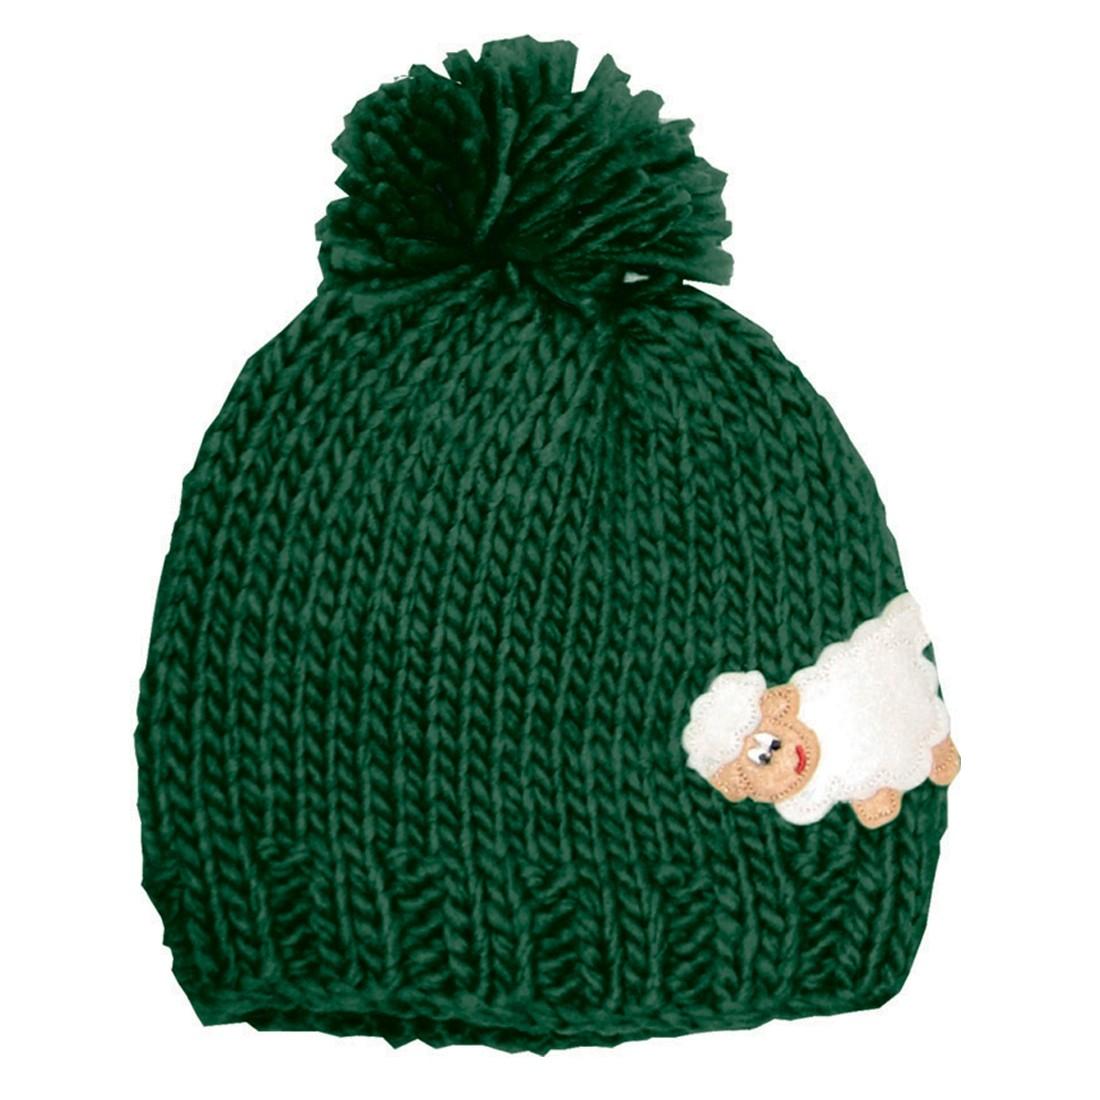 Kids Green Irish Knit Hat with Sheep